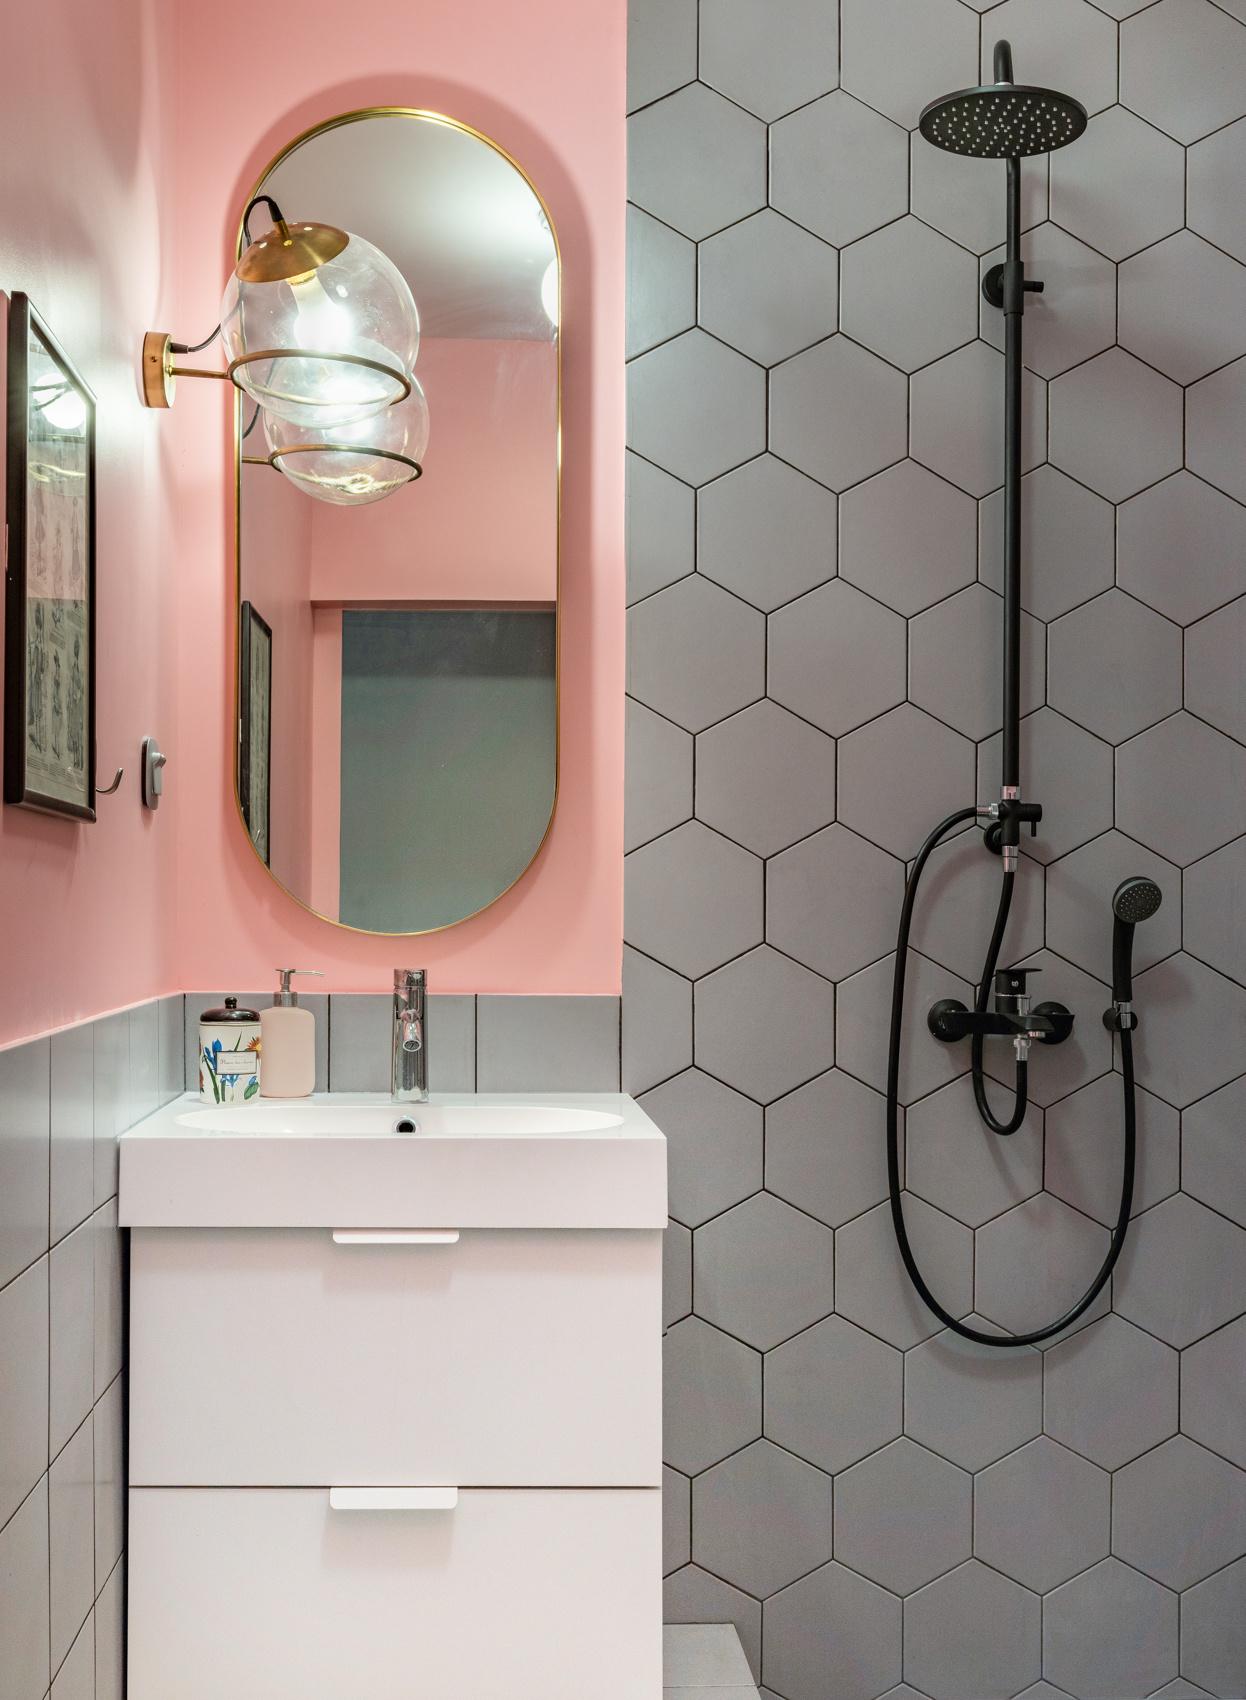 плитка в ванной (галерея 0, фото 5)